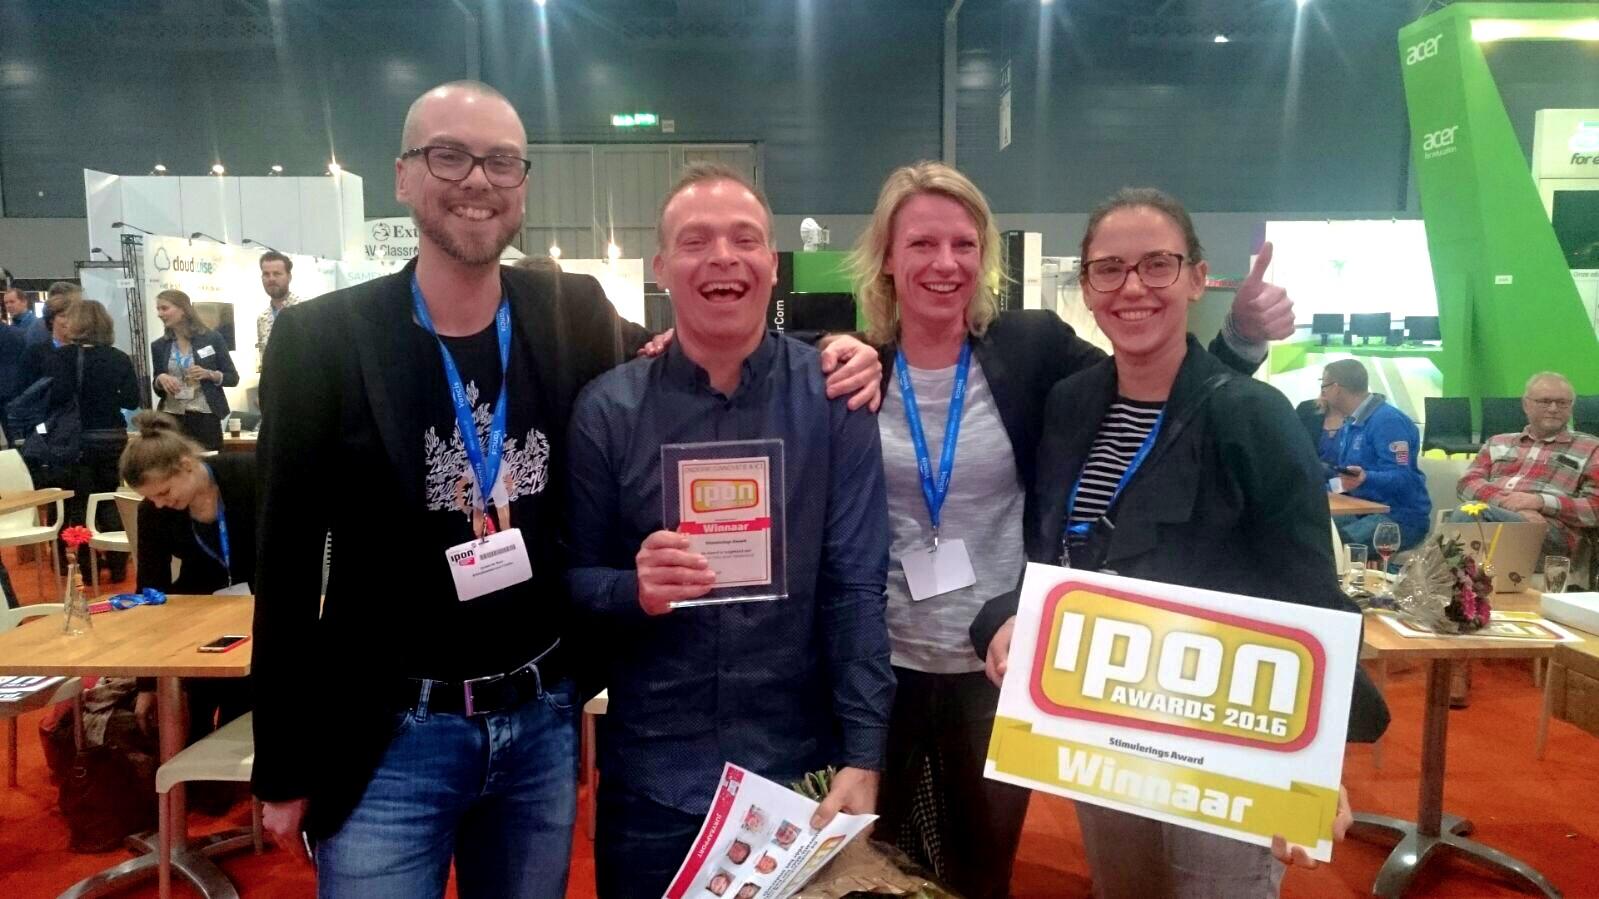 Gewonnen! v.l.n.r: Jeroen de Boer, Per-Ivar Kloen, Karien Vermeulen, Mariska Hamelink